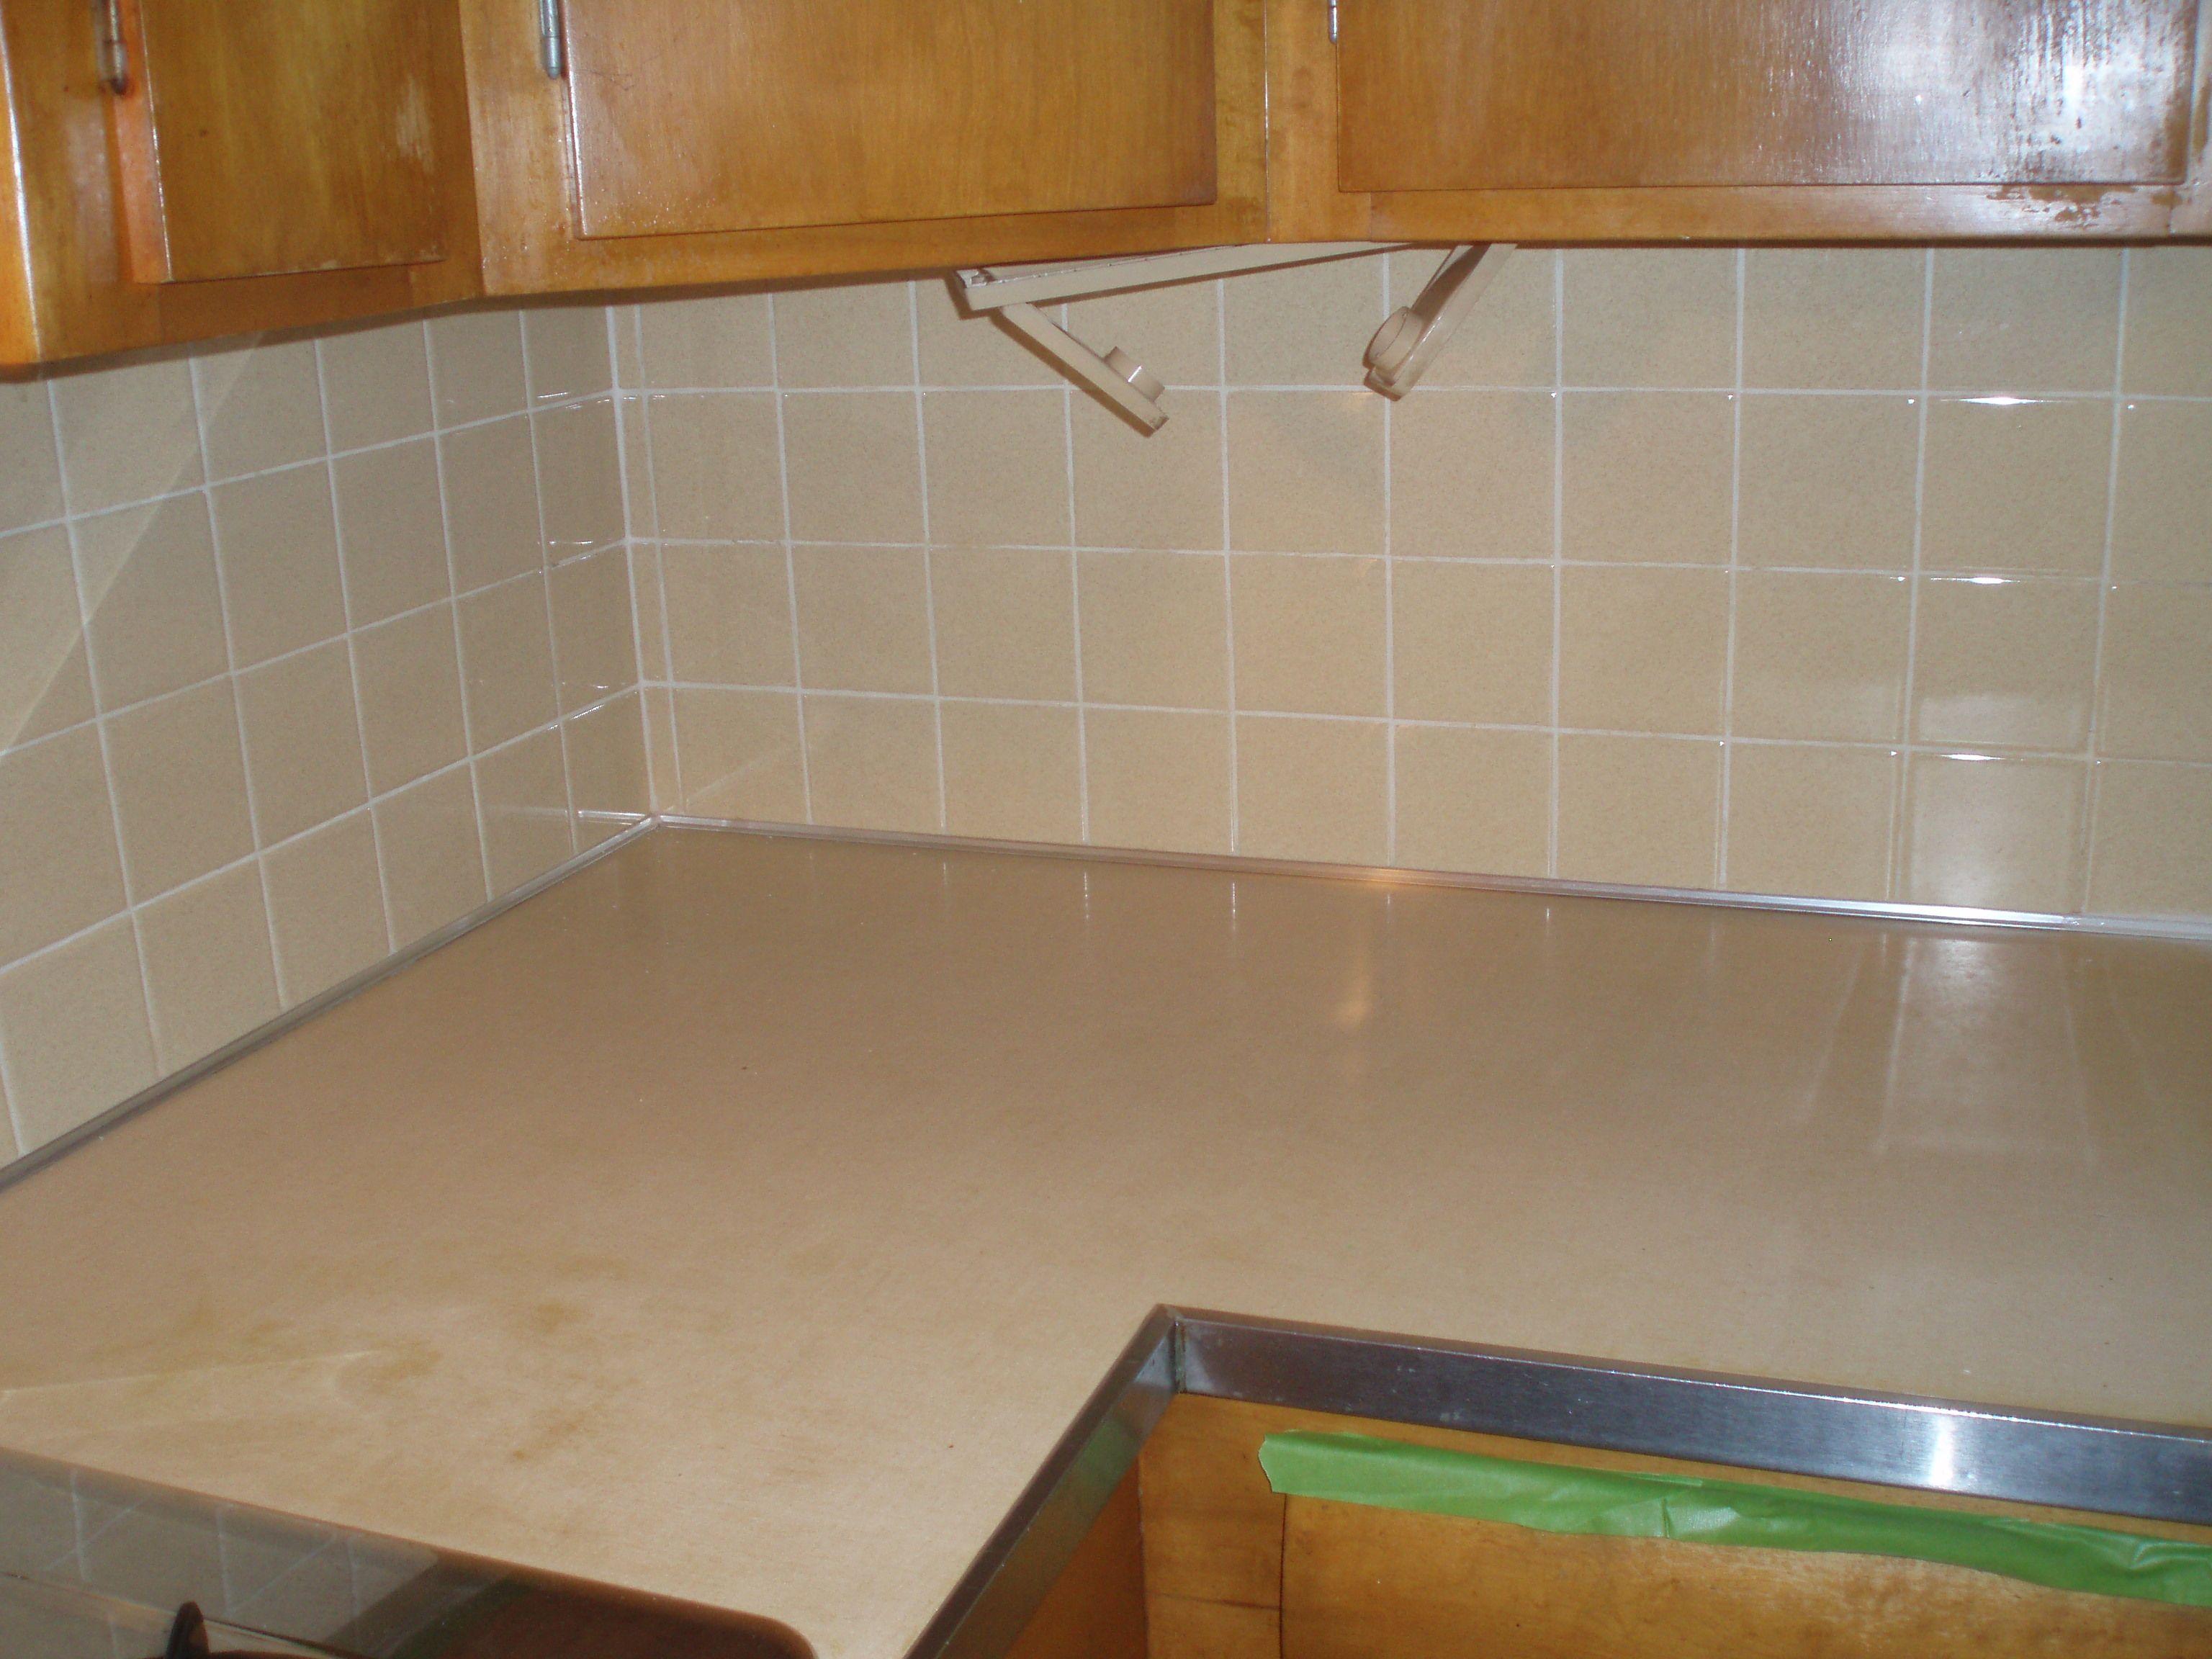 Painting tile backsplash home stuff pinterest painting tile how to paint a ceramic tile backsplash doublecrazyfo Gallery